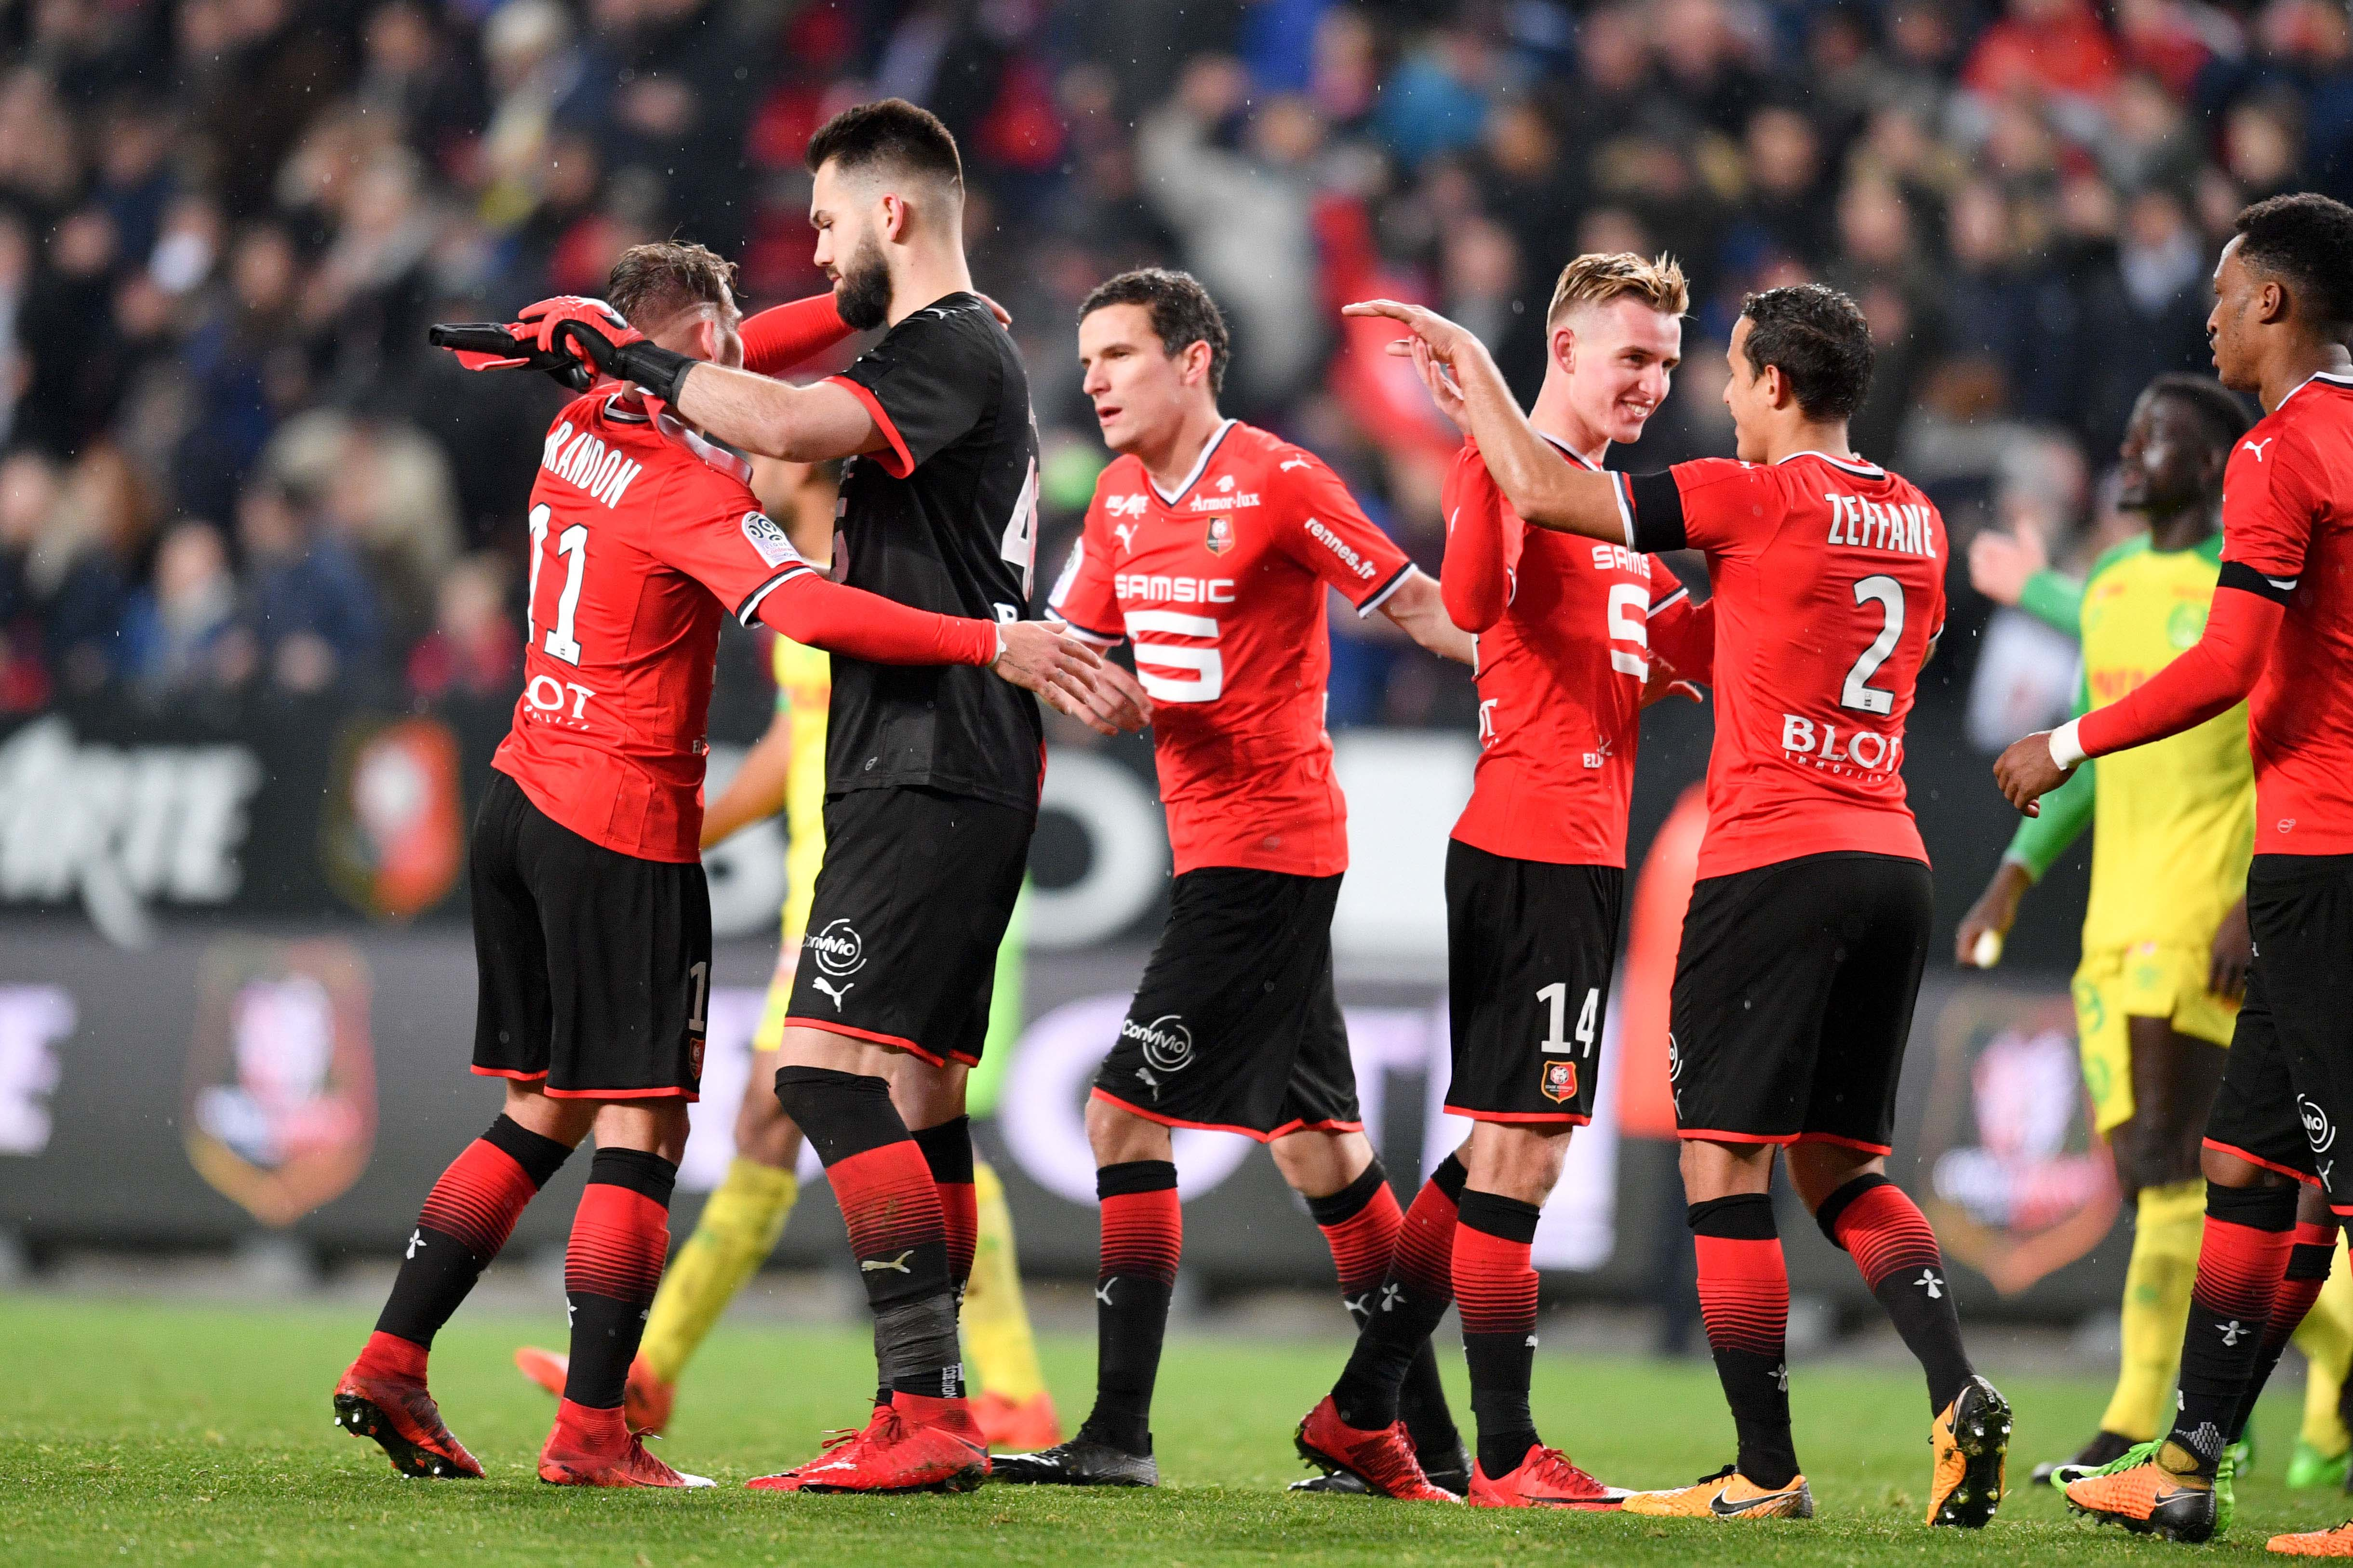 Football - Ligue 1 - Rennes européen : La «Roazhontada» en 5 dates